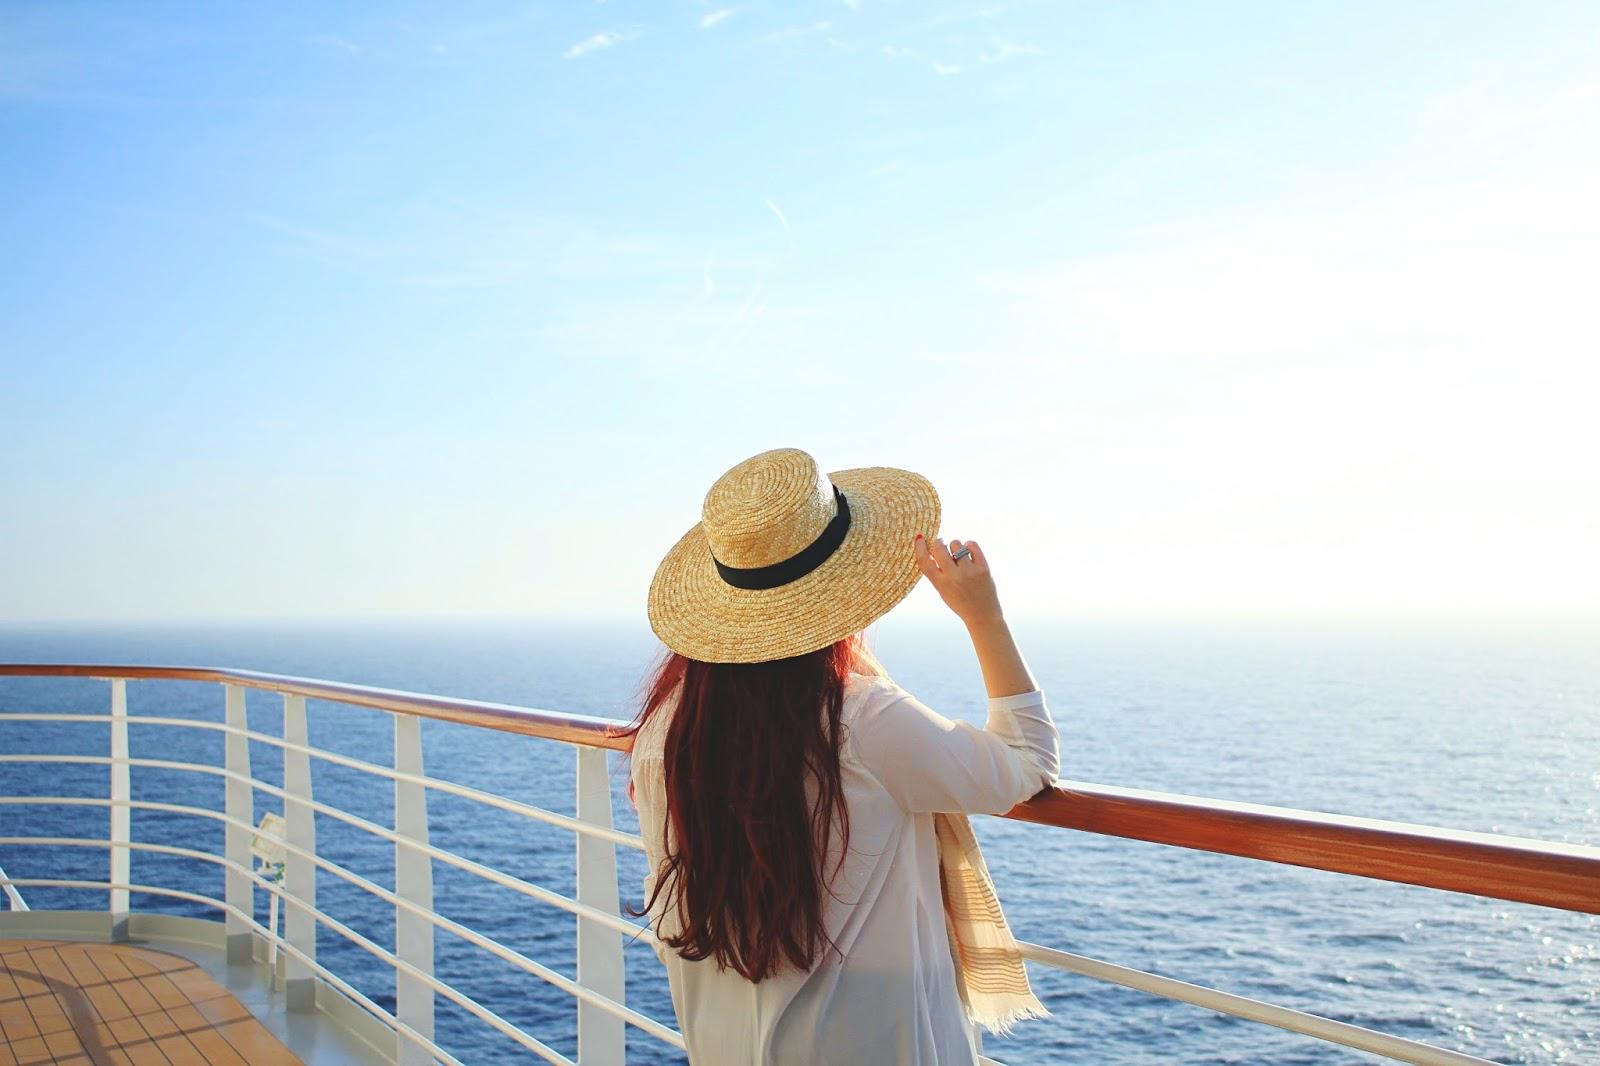 costa voyage